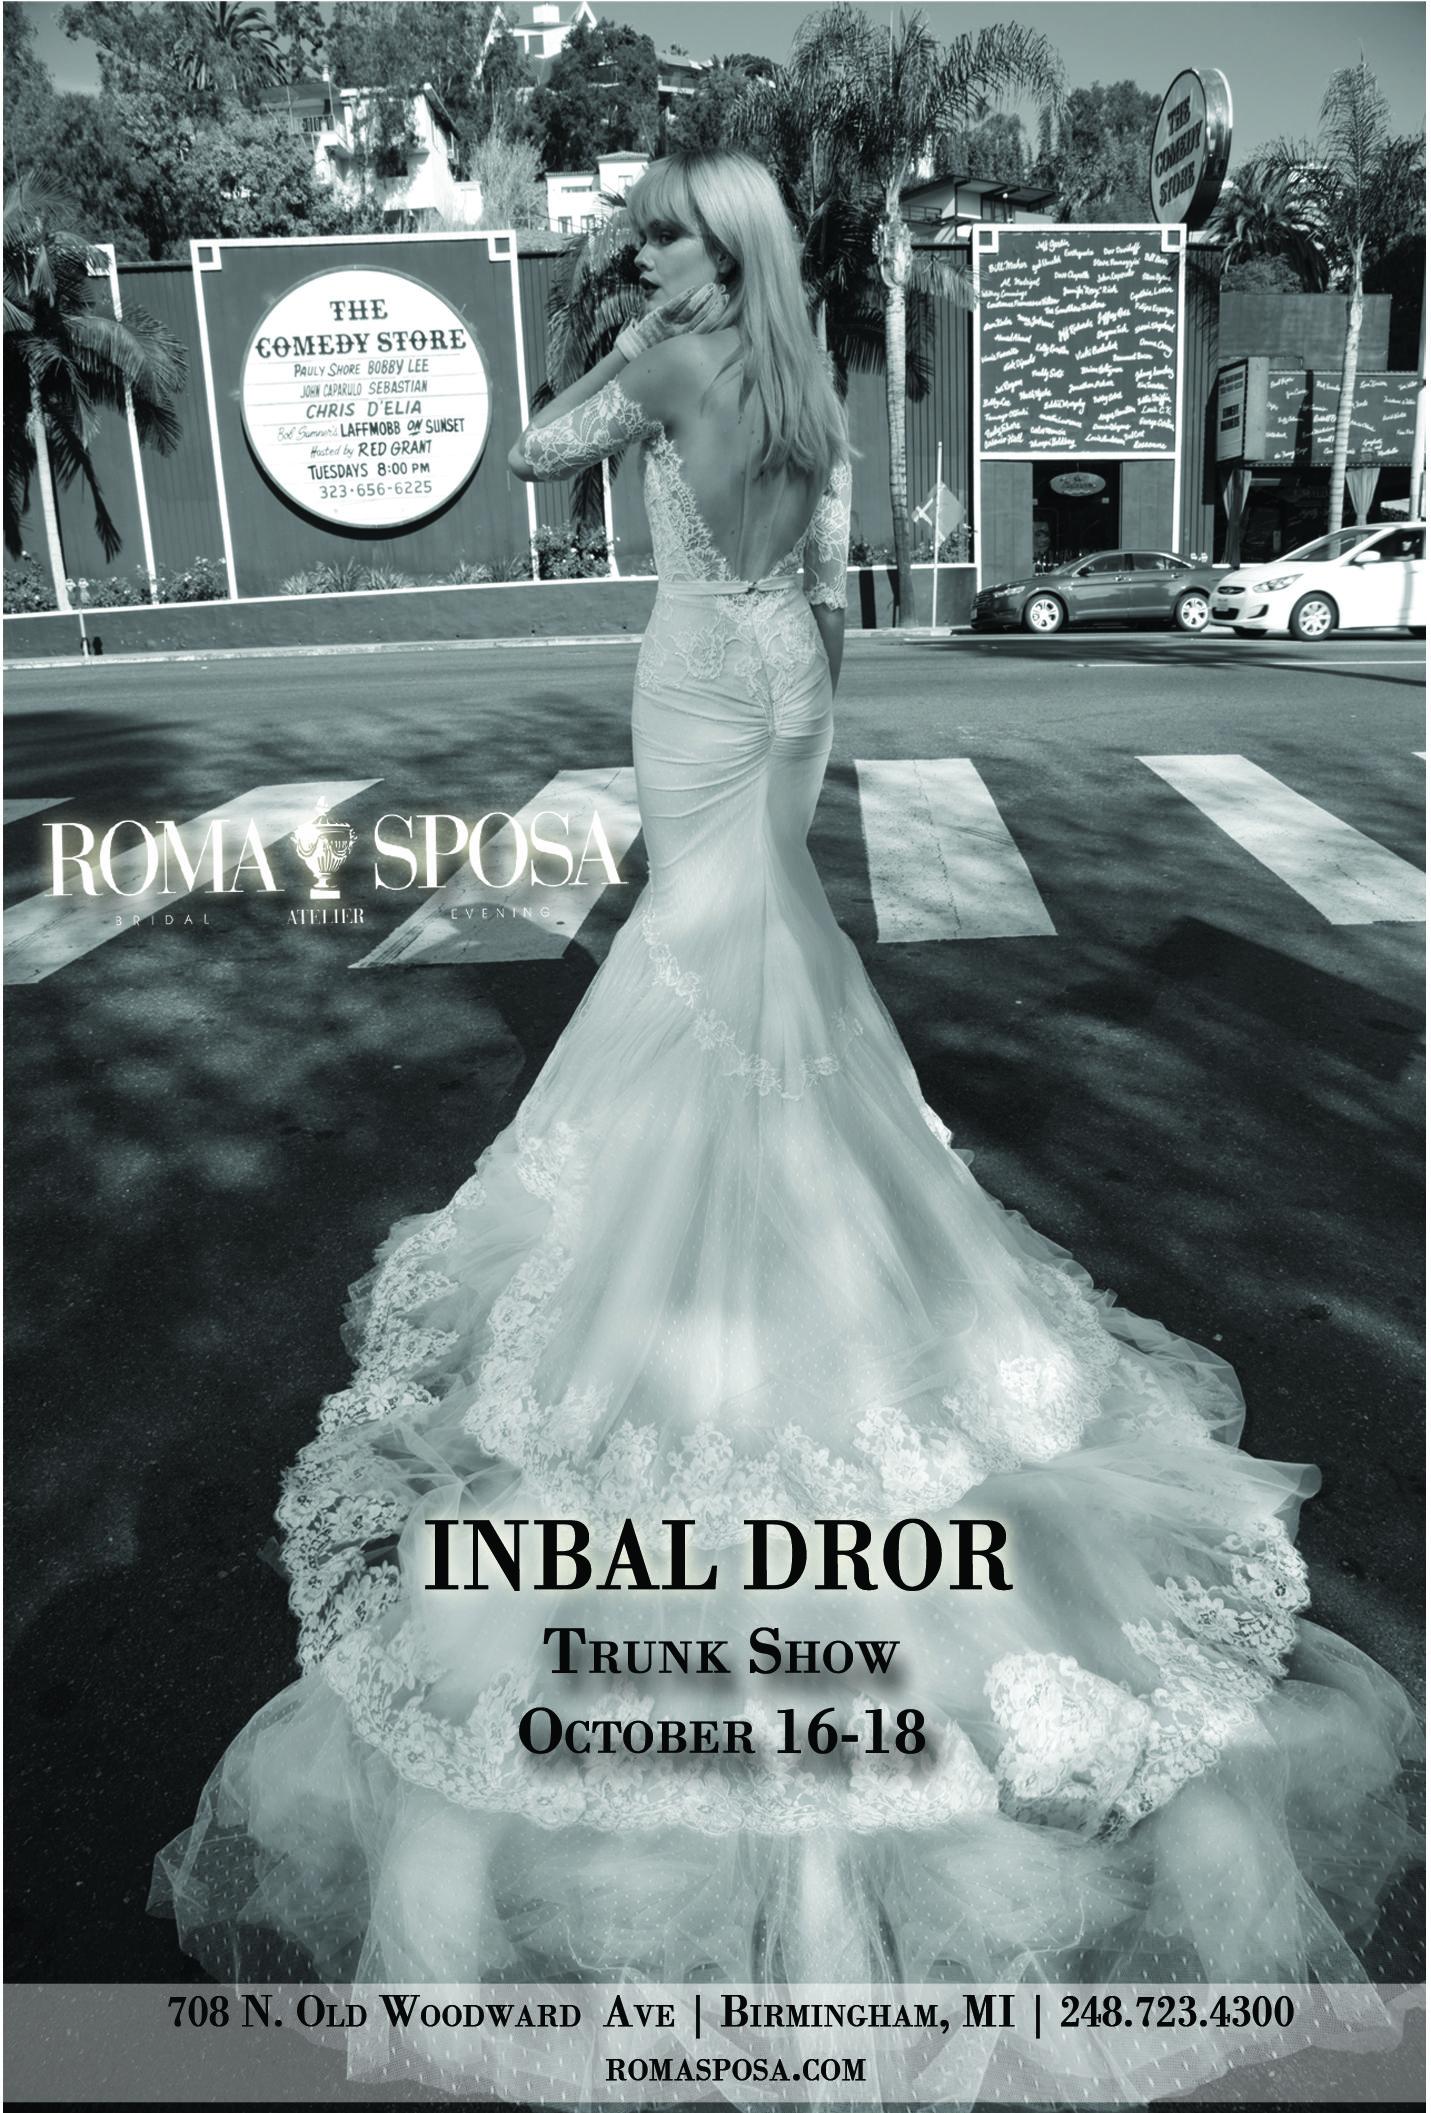 Inbal Dror Trunk Show! October 16-18 | Upcoming Events | Pinterest ...